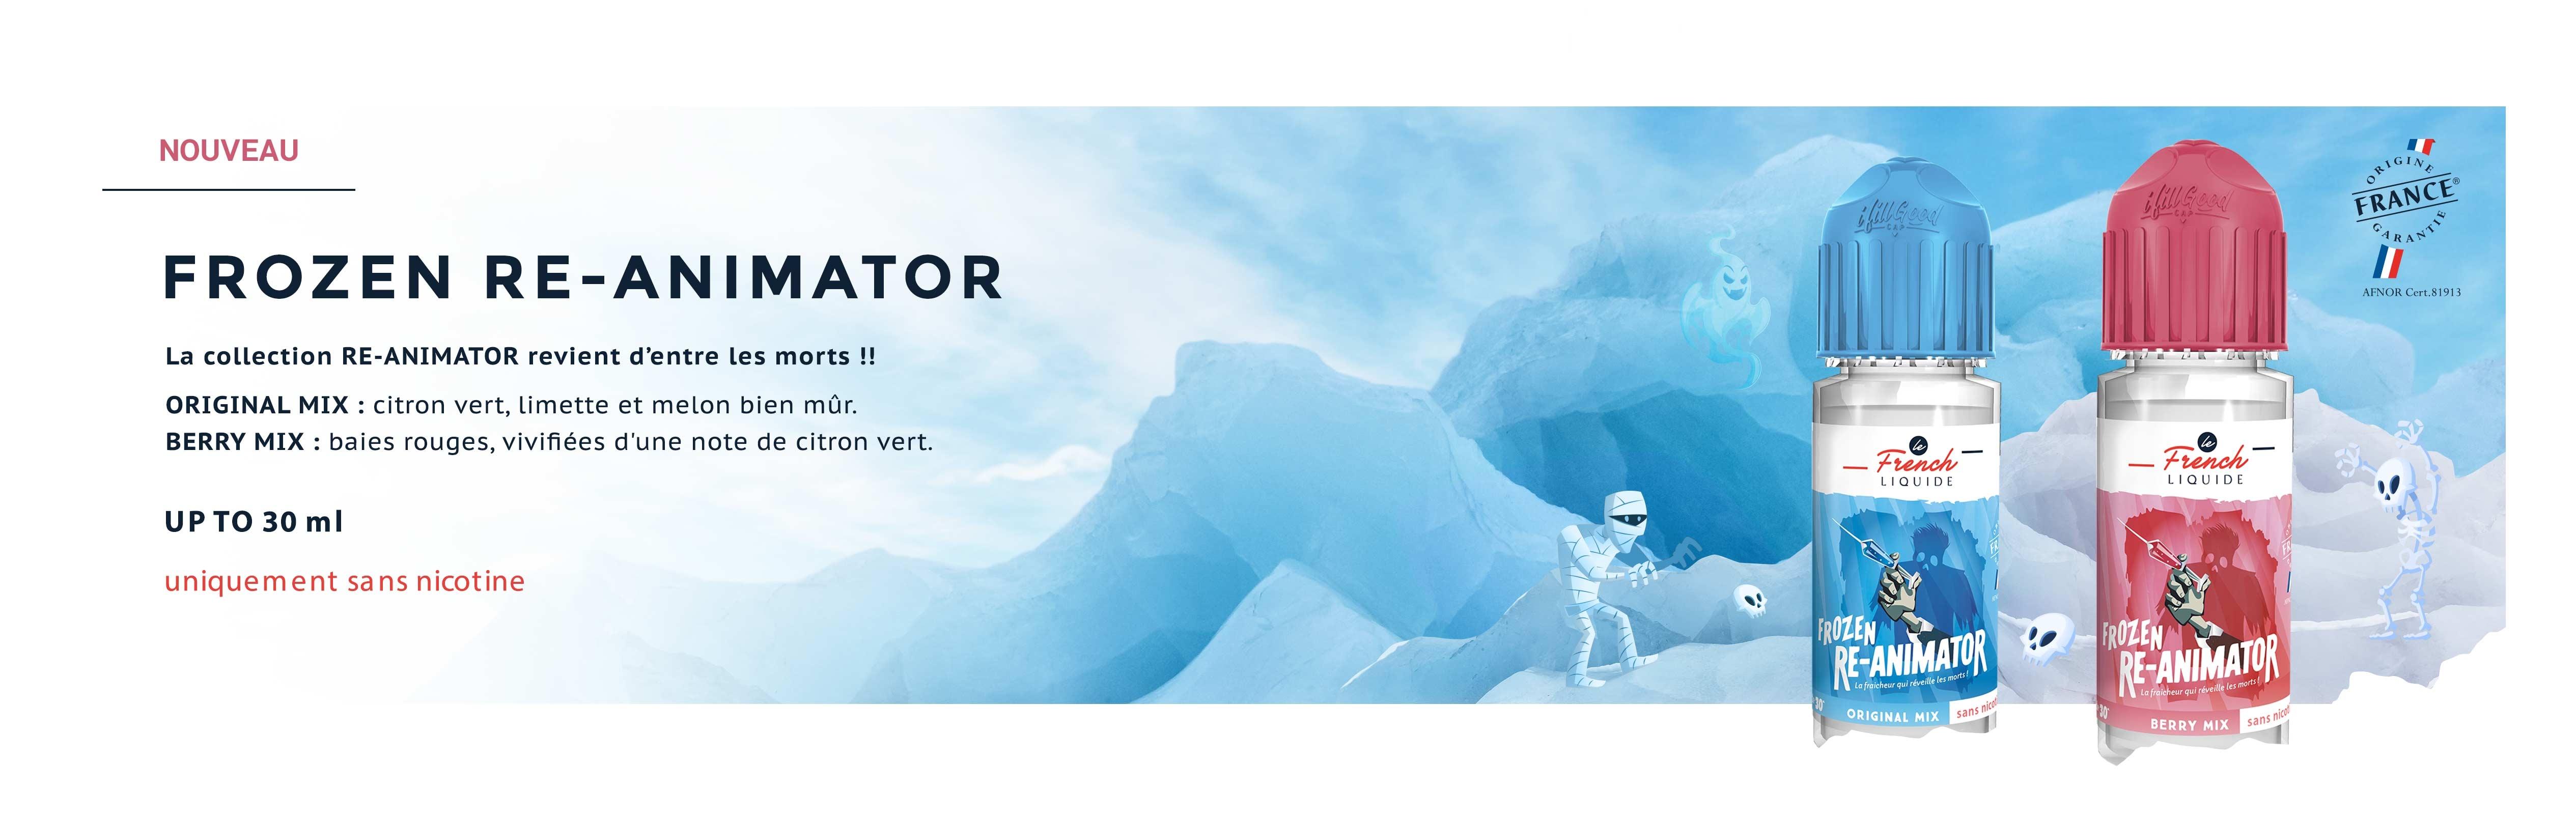 Frozen Re-Animator